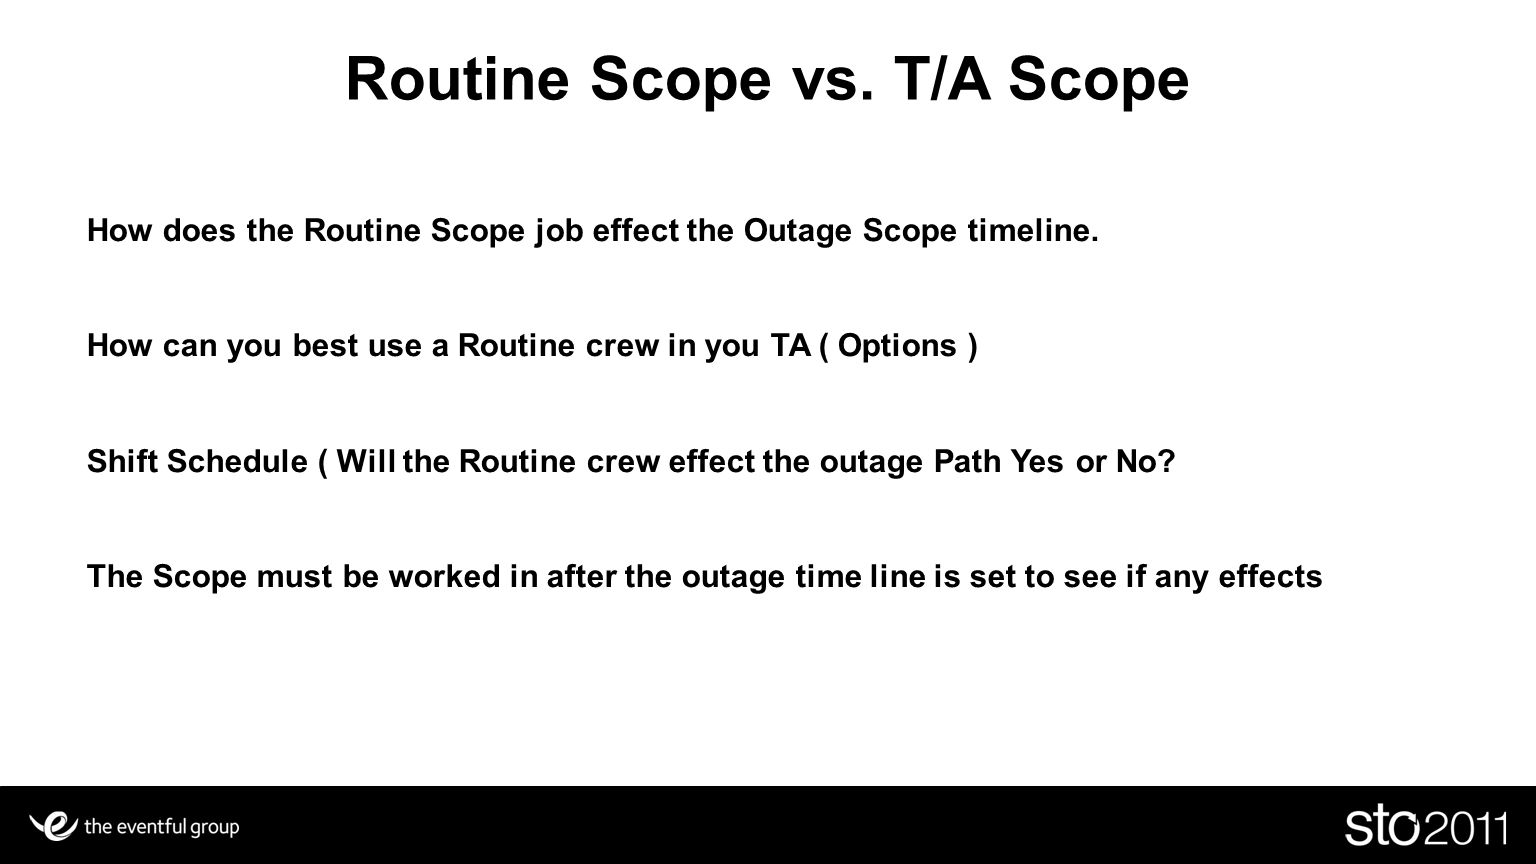 Routine Scope vs. T/A Scope